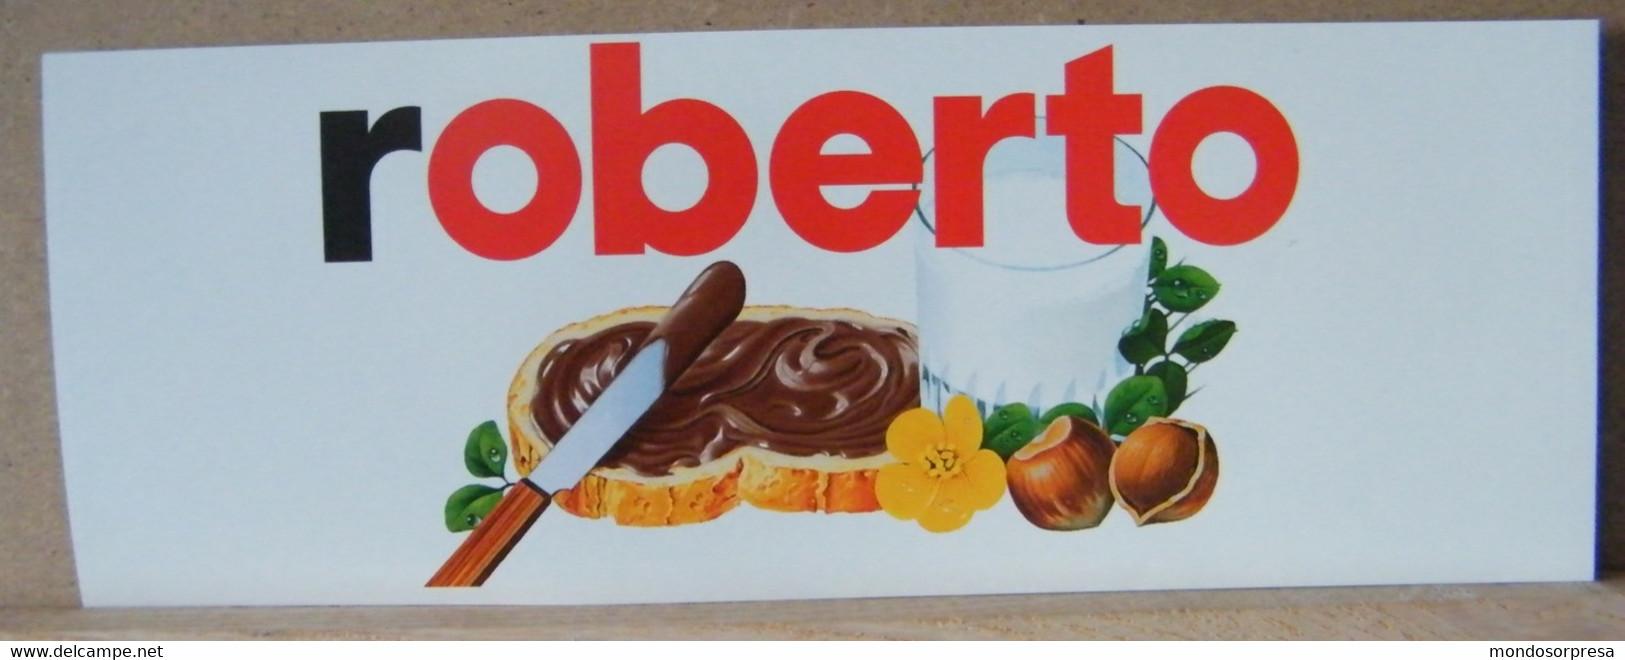 MONDOSORPRESA, ADESIVI NUTELLA NOMI, ROBERTO - Nutella